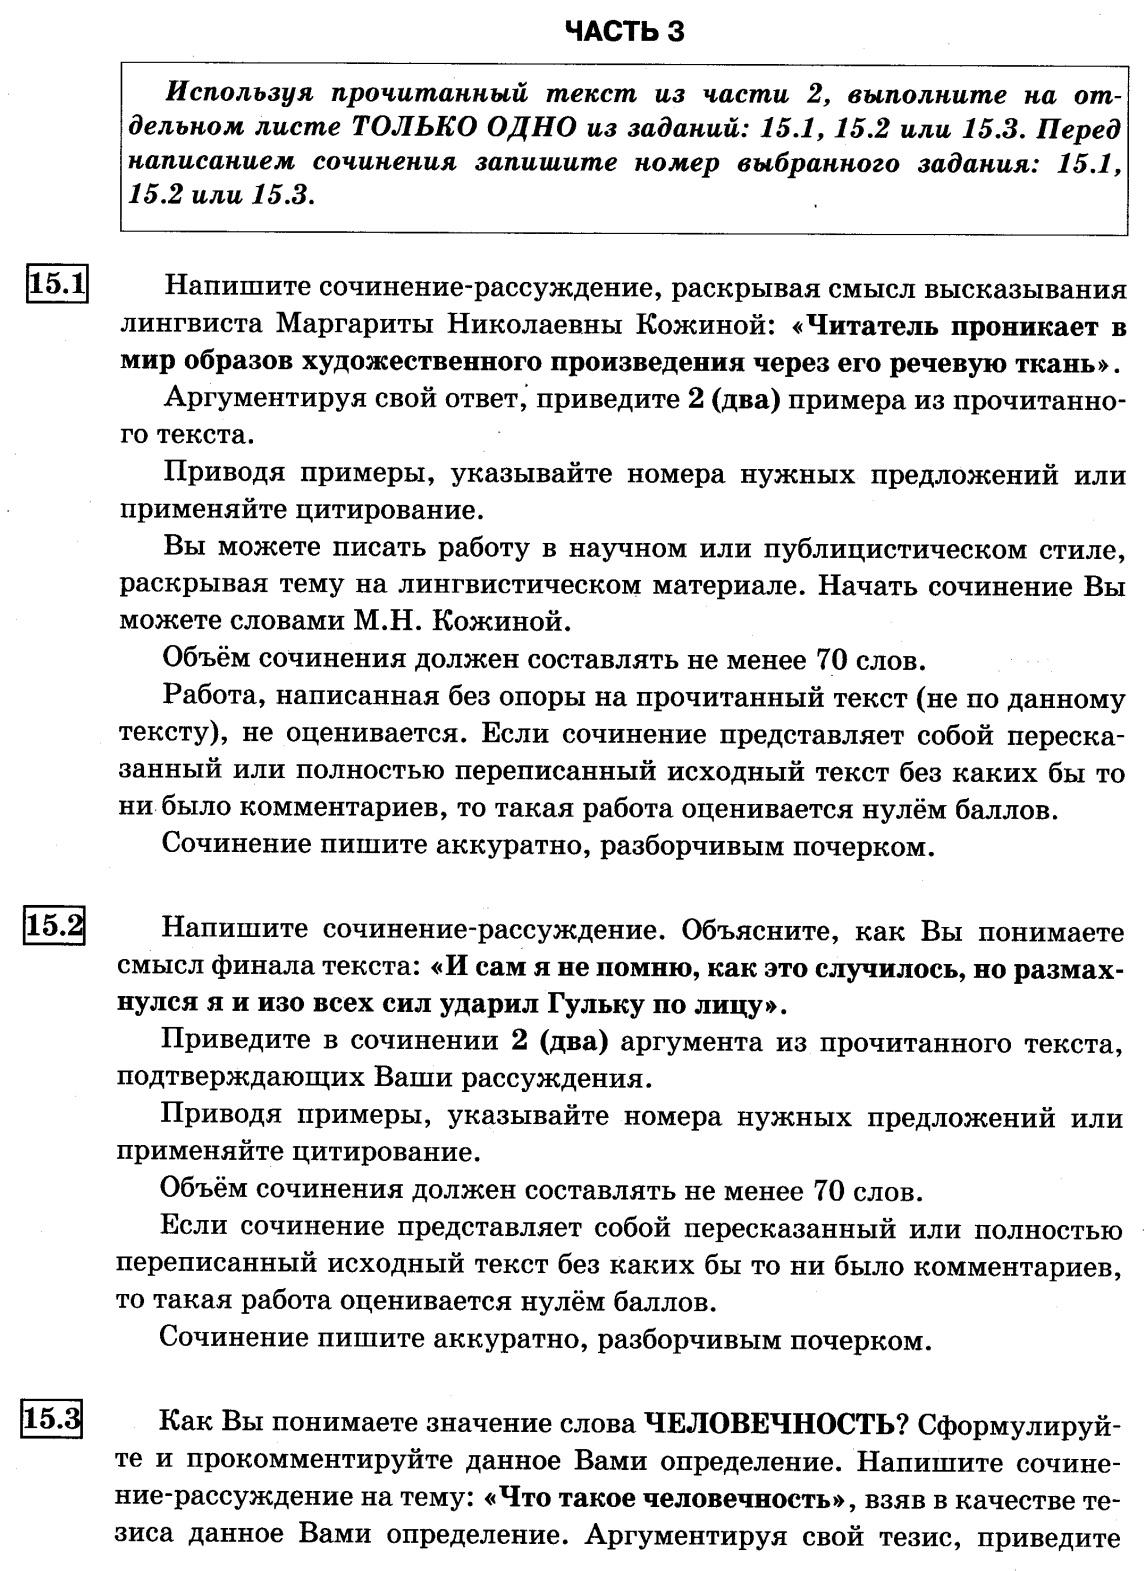 C:\Documents and Settings\Наташа\Рабочий стол\ОГЭ 2016\КИМы Степановой ОГЭ-2016\img287.jpg